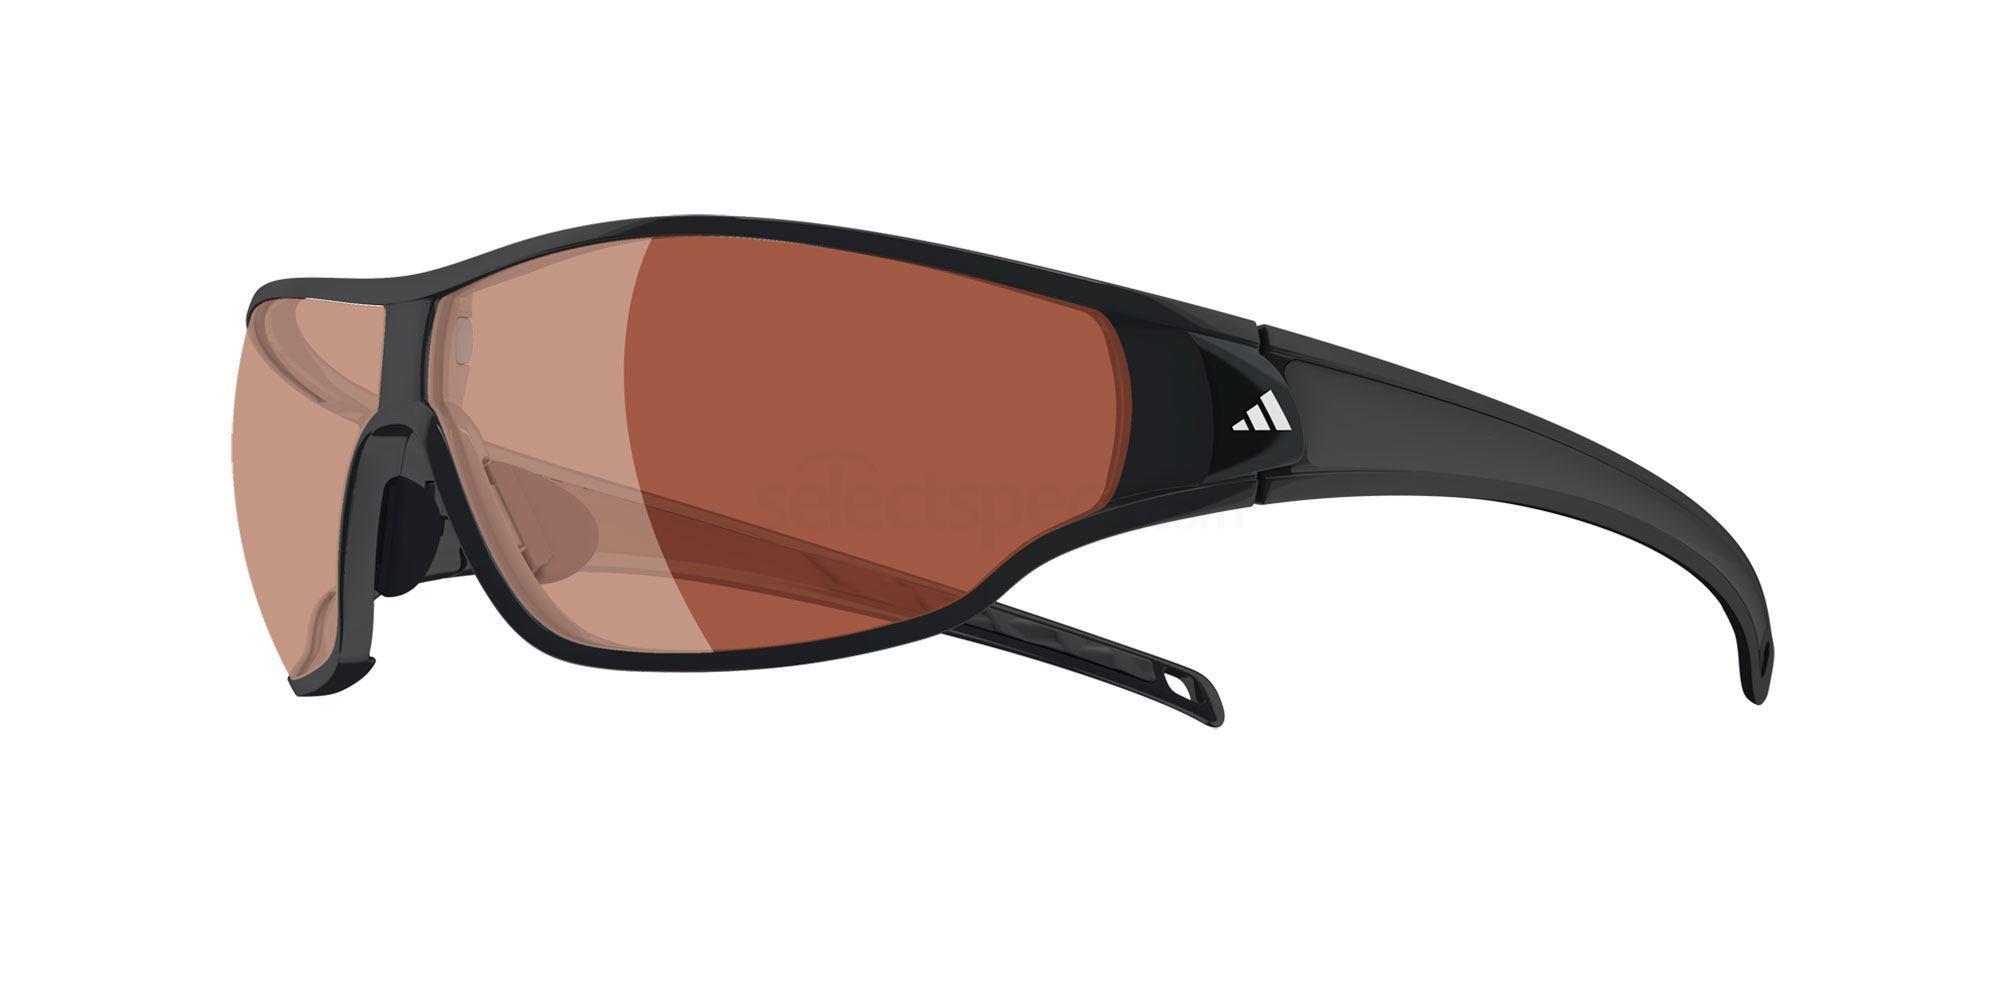 00 6050 a191 Tycane L Sunglasses, Adidas